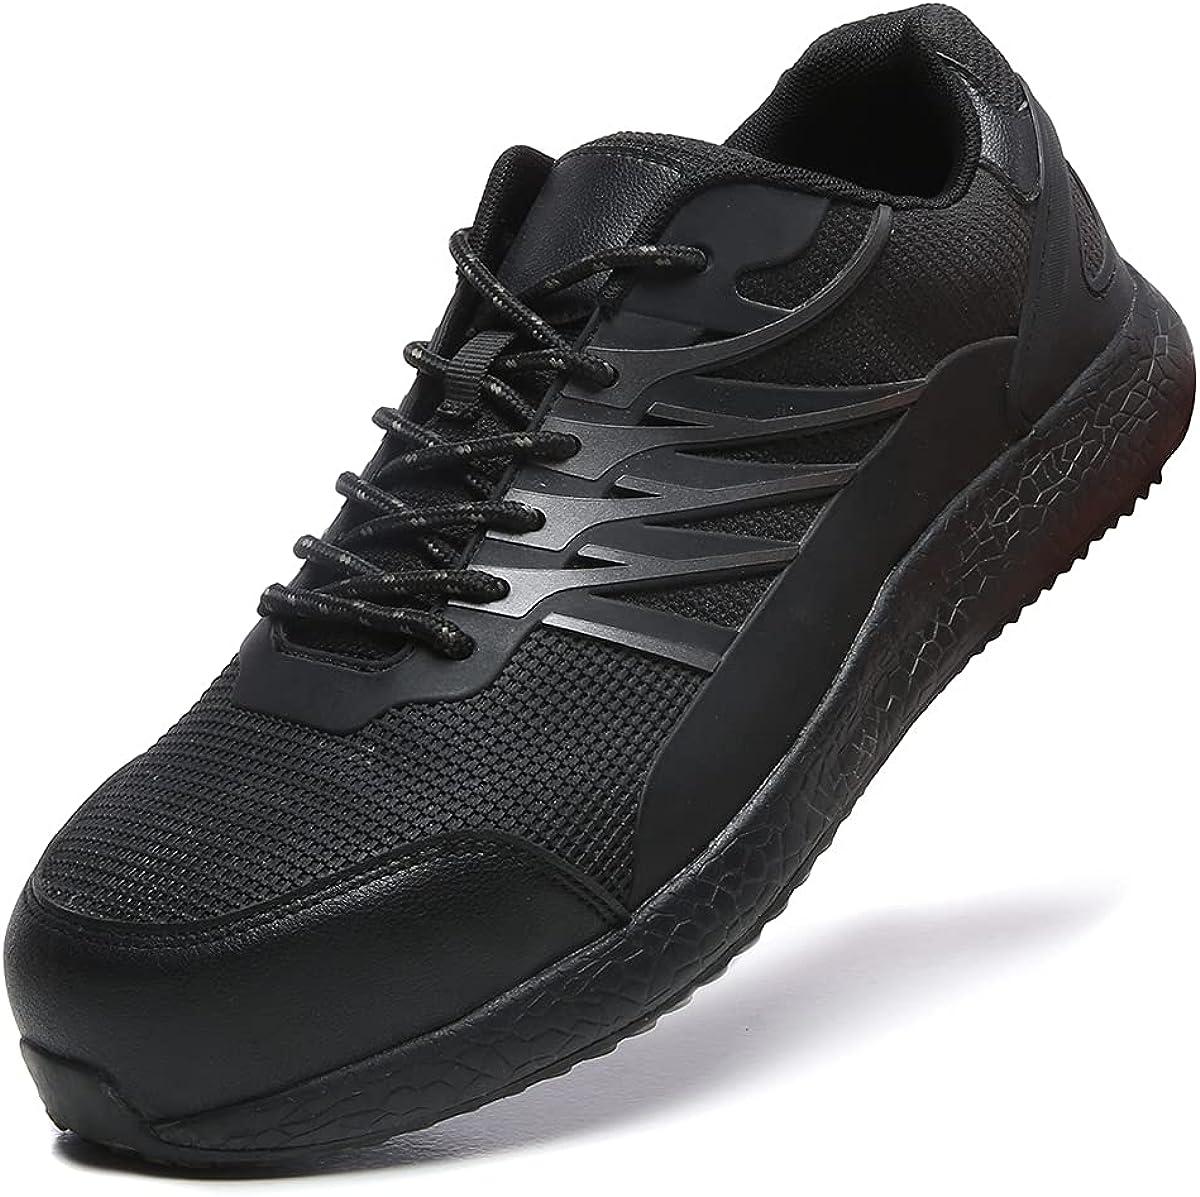 Oklahoma City Mall BAOLUMA Men's Industrial Construction Shoe Athletic Toe Steel outlet